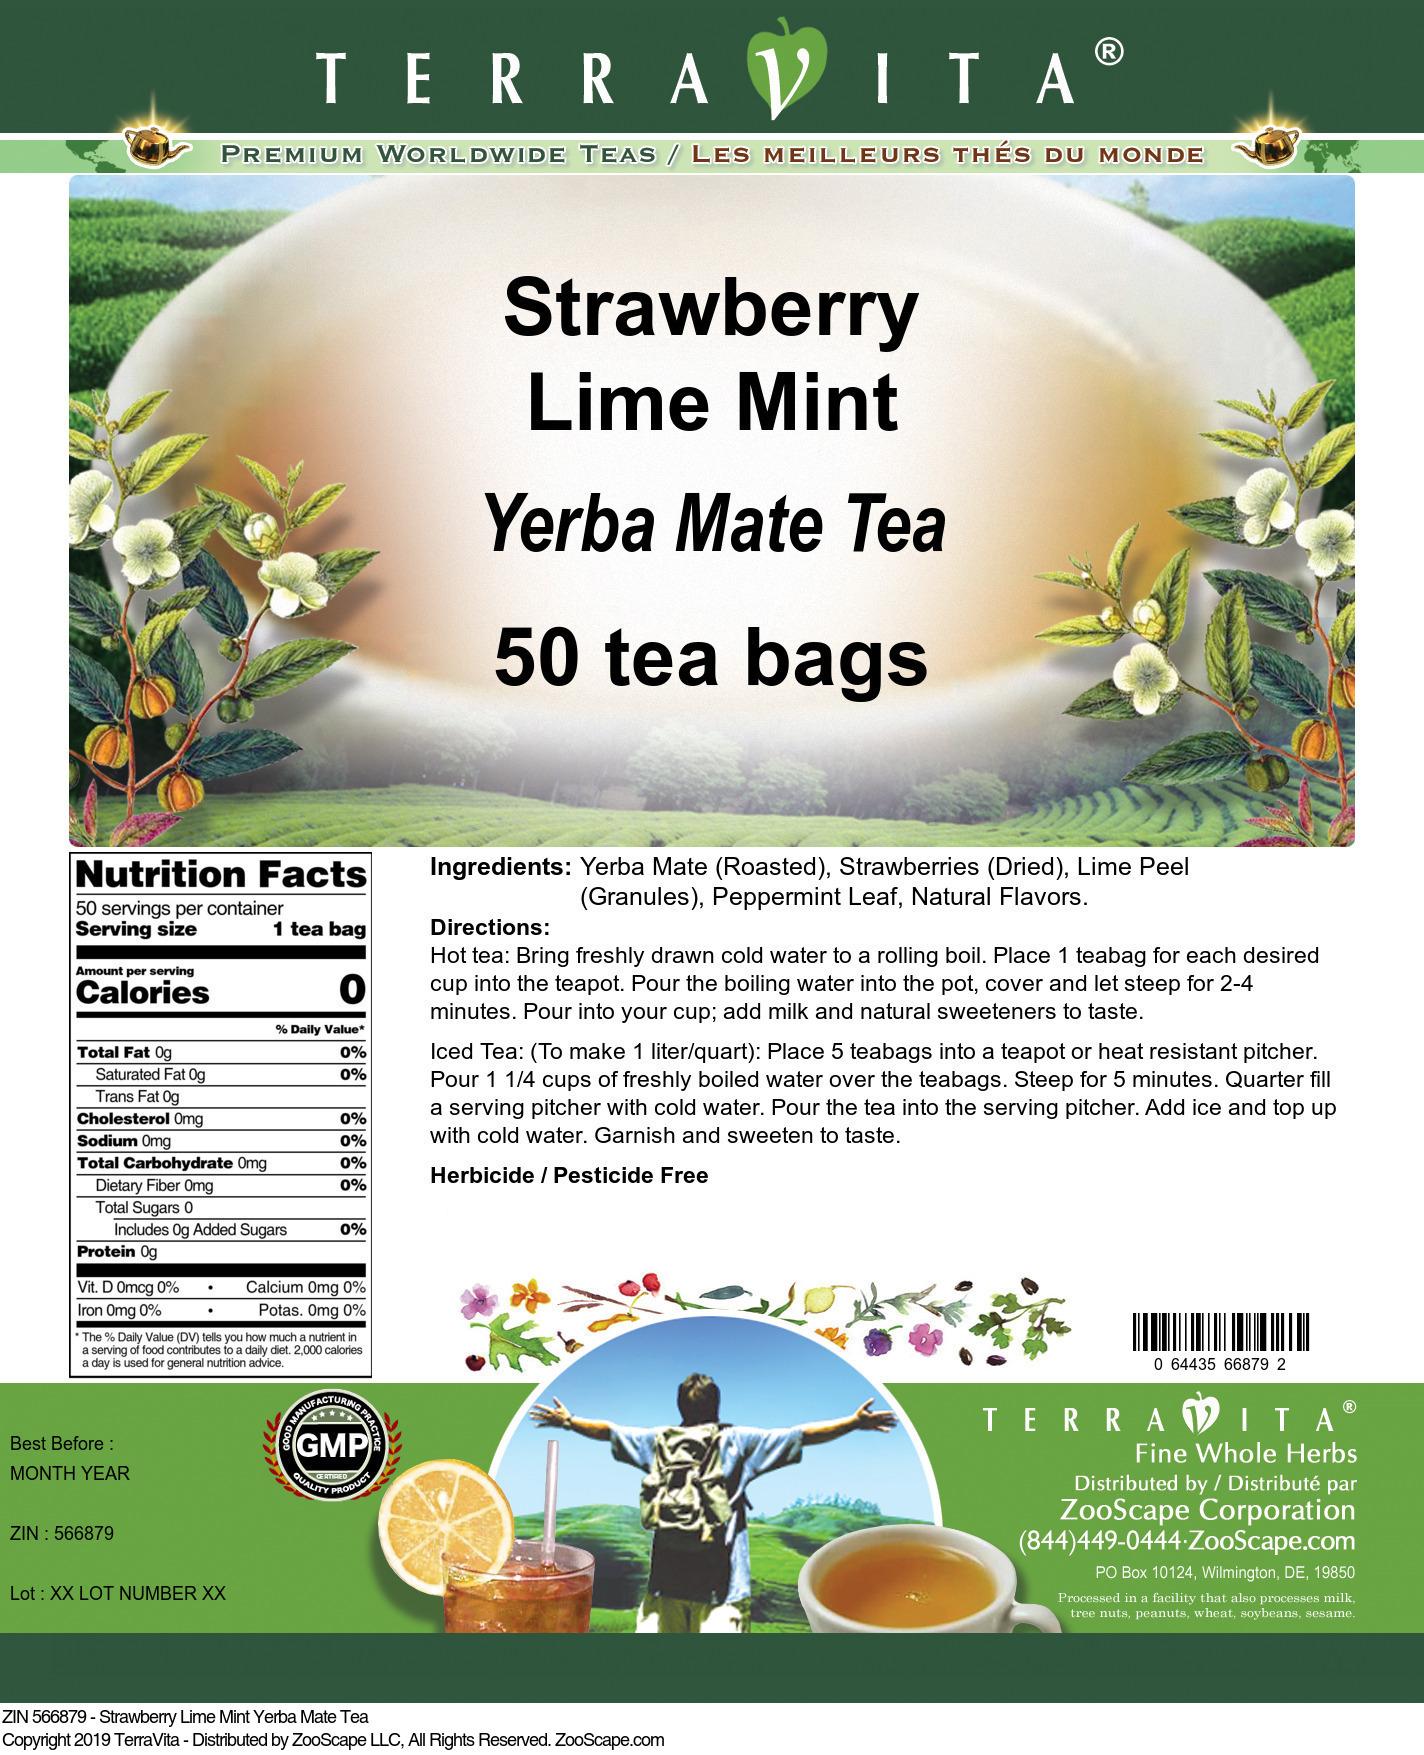 Strawberry Lime Mint Yerba Mate